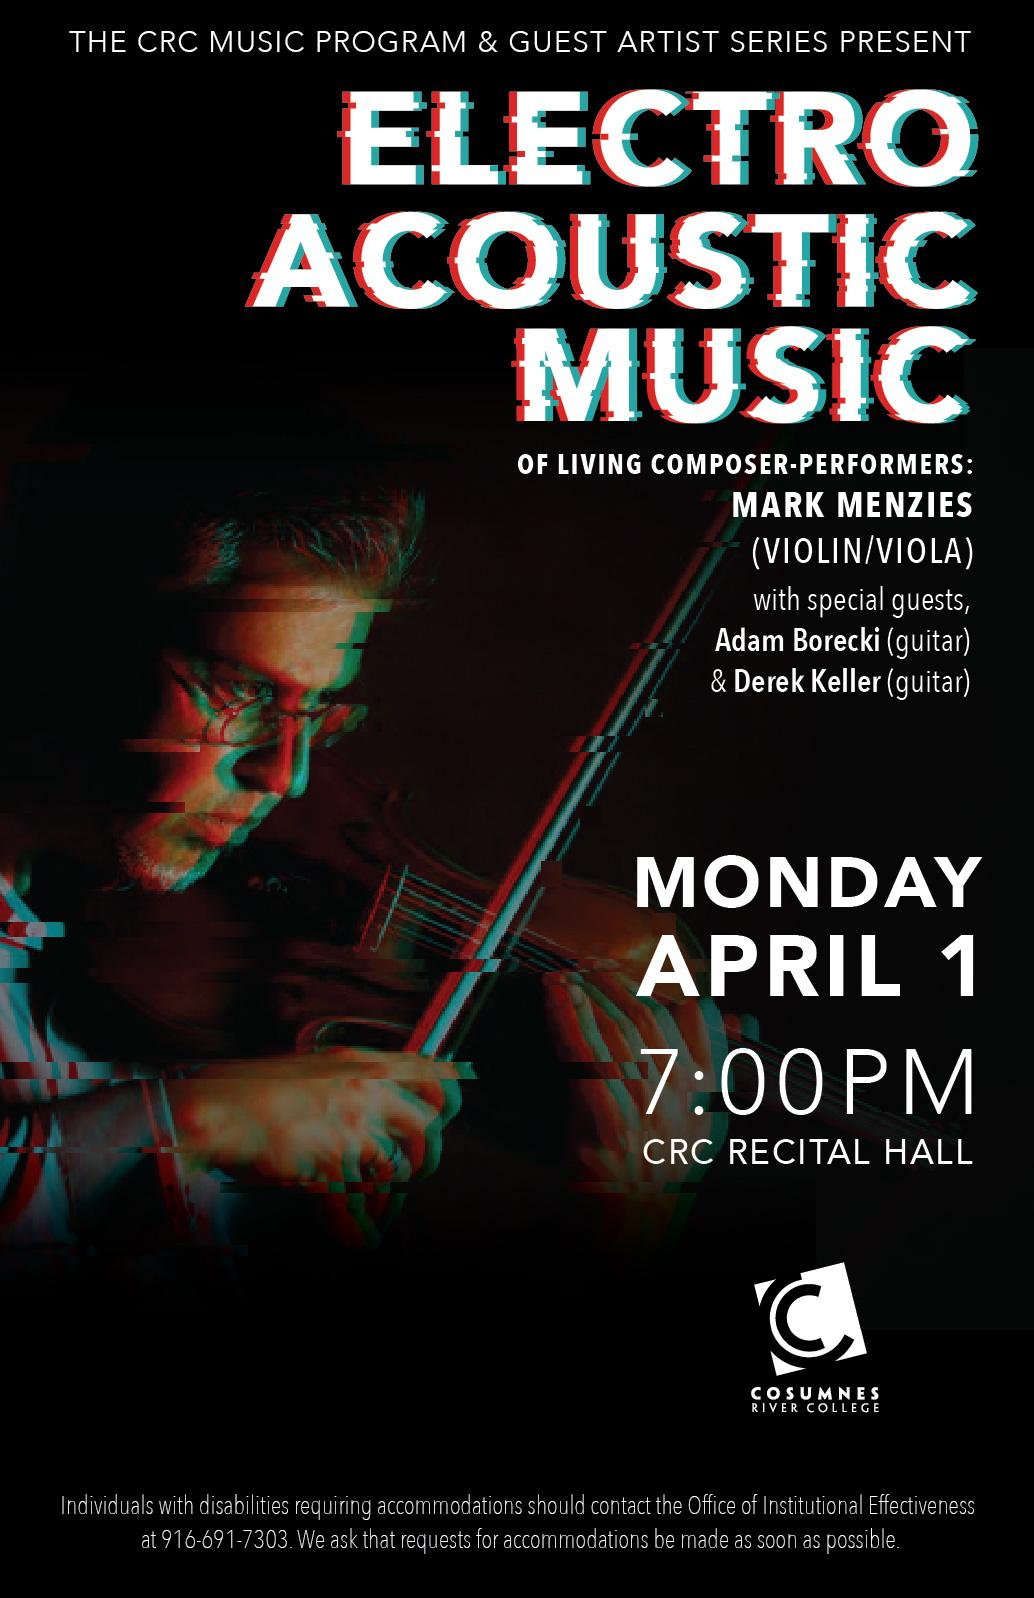 The CRC Music Program & Guest Artist Series Present Tickets